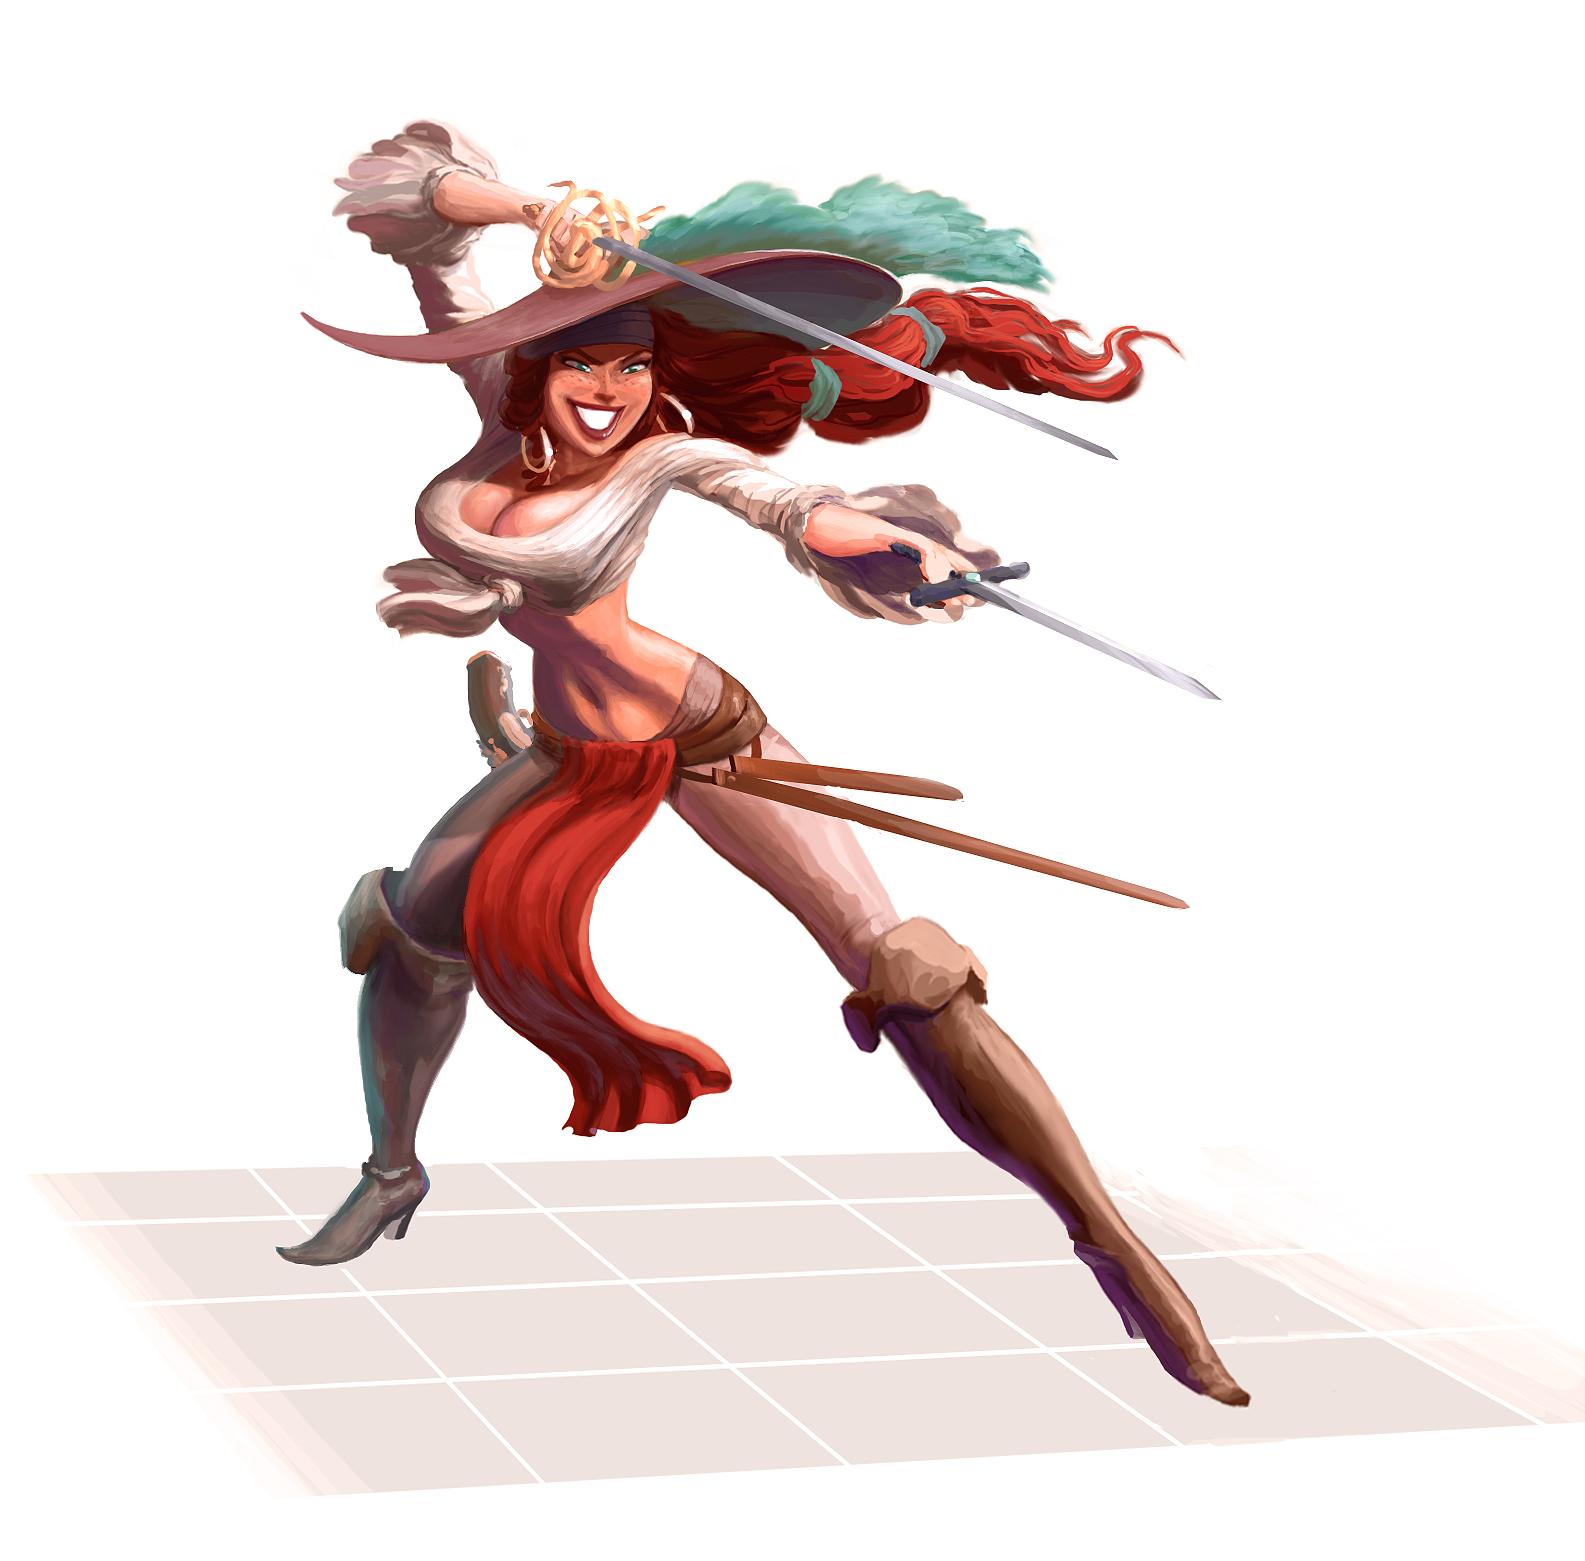 Pirategirl.jpg